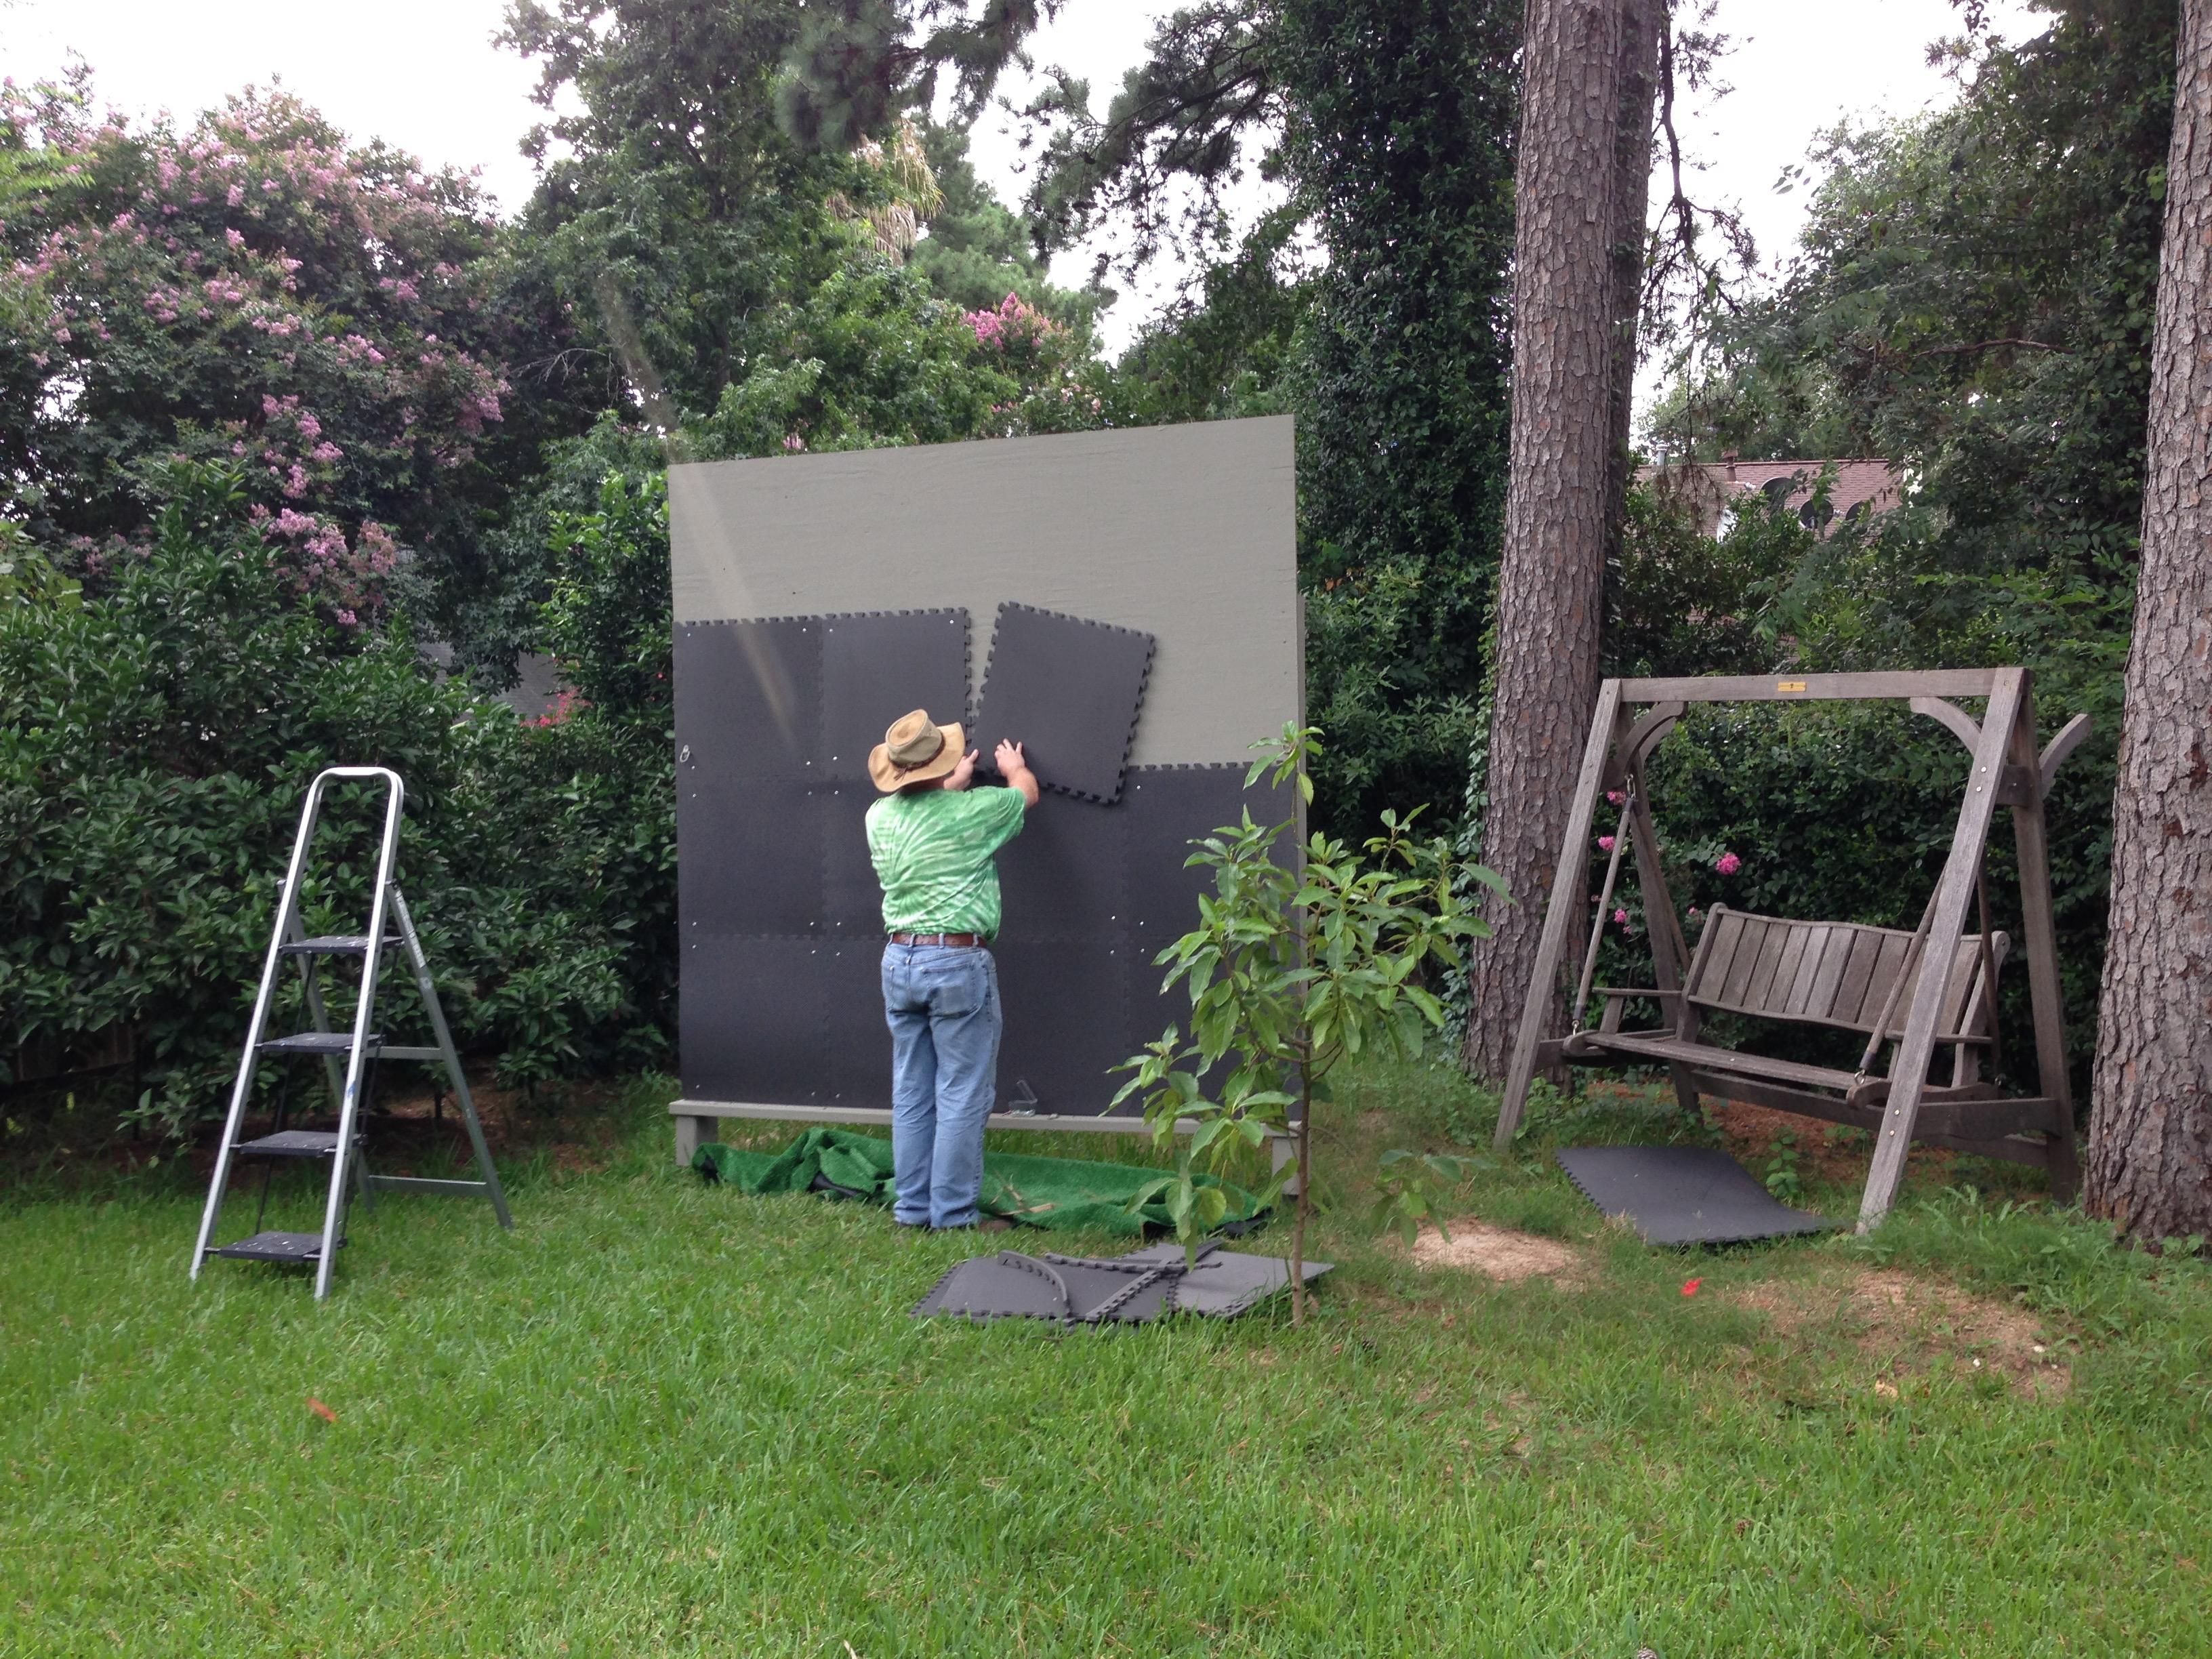 Building Your Suburban Outdoor Archery Range - Surviving ...